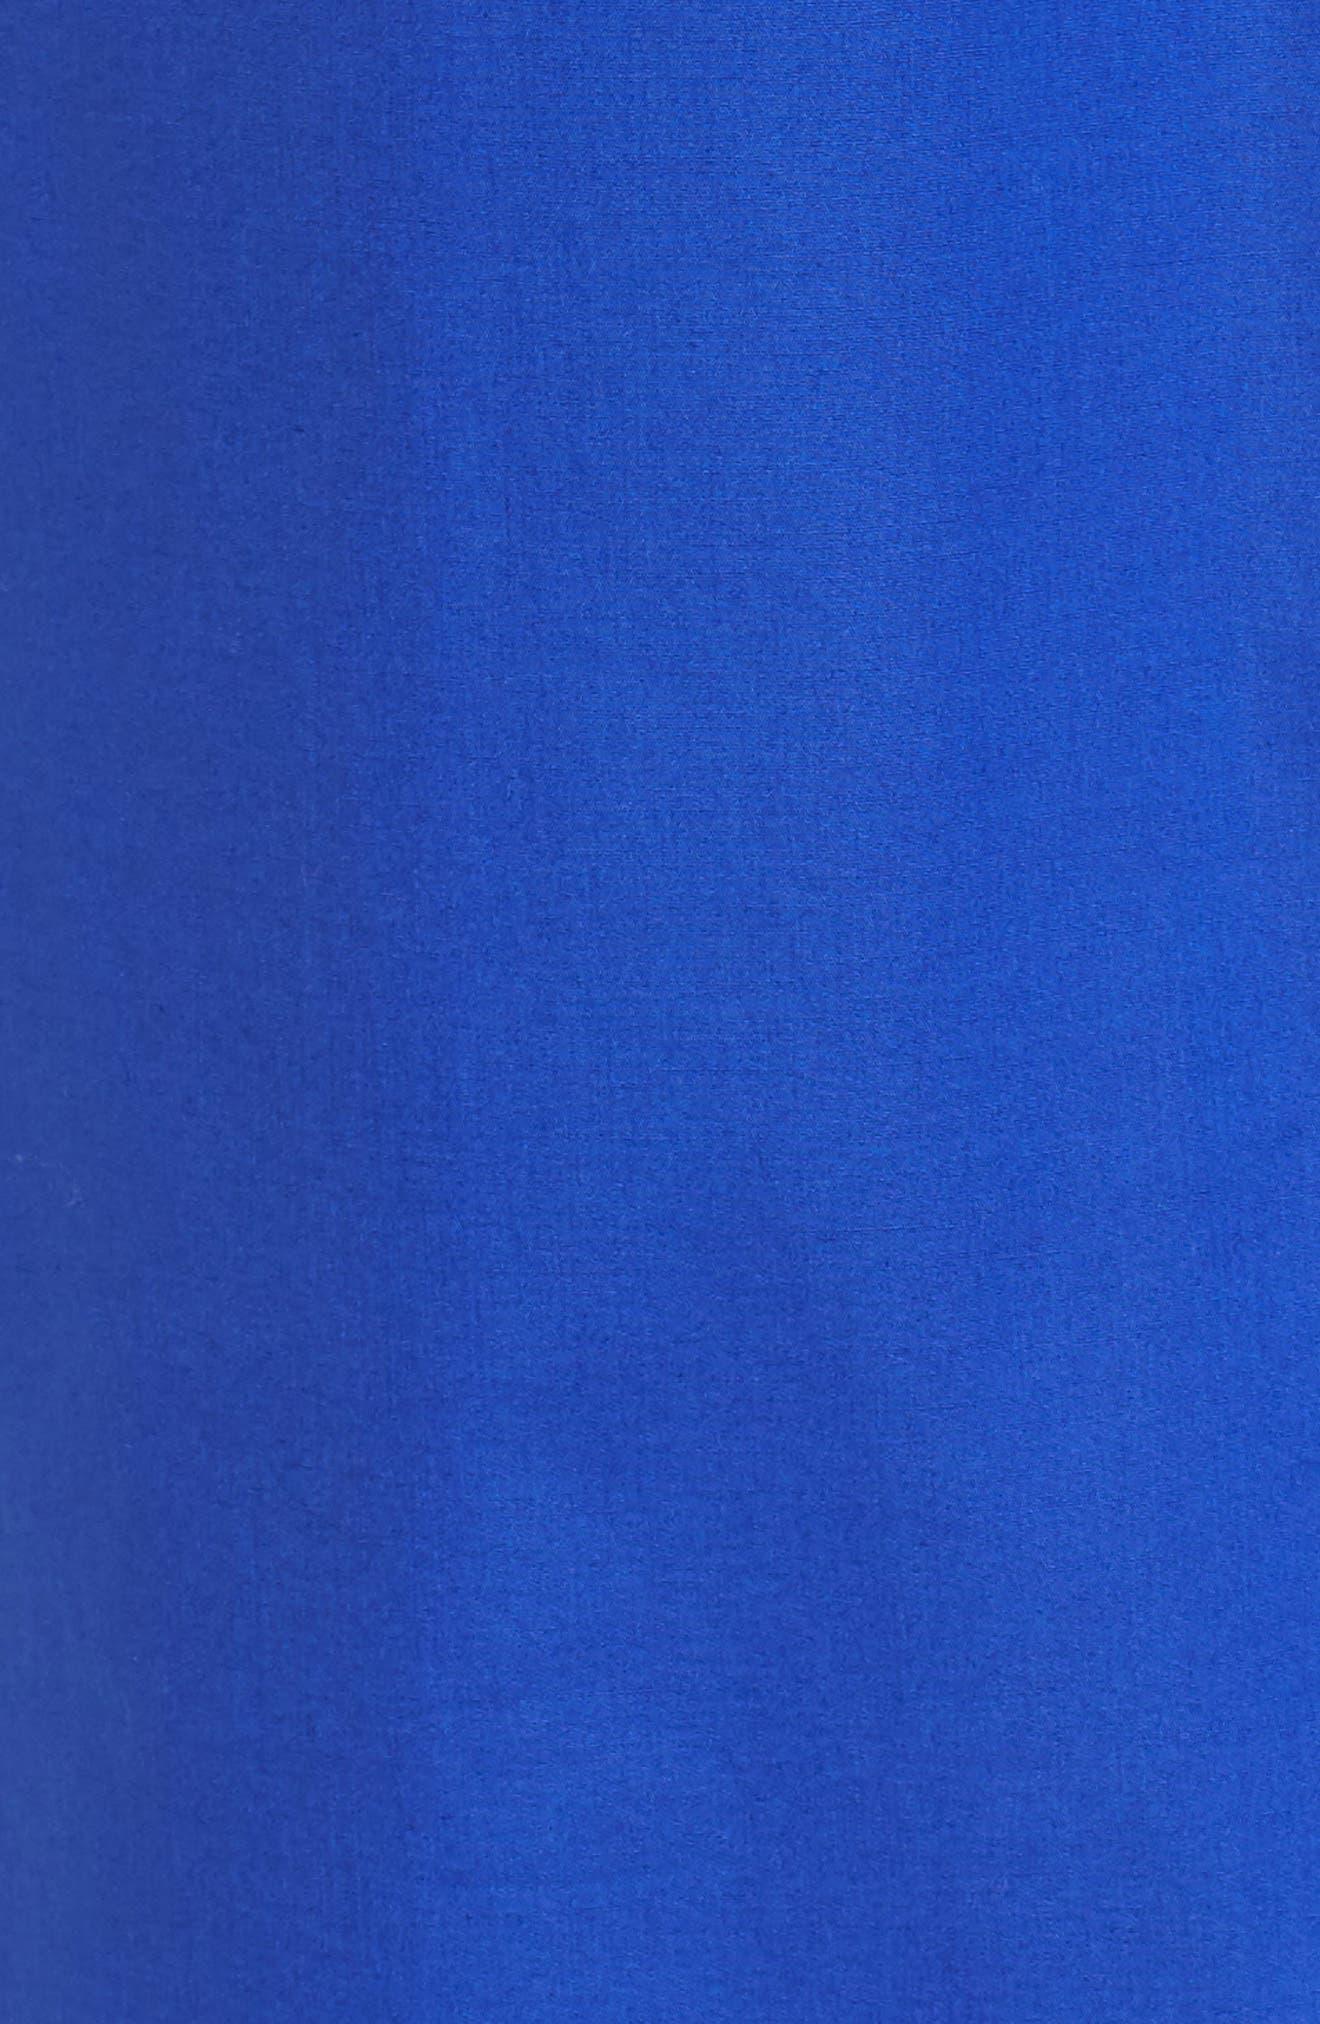 Dashir Stretch Cotton Shirtdress,                             Alternate thumbnail 5, color,                             Sailor Blue